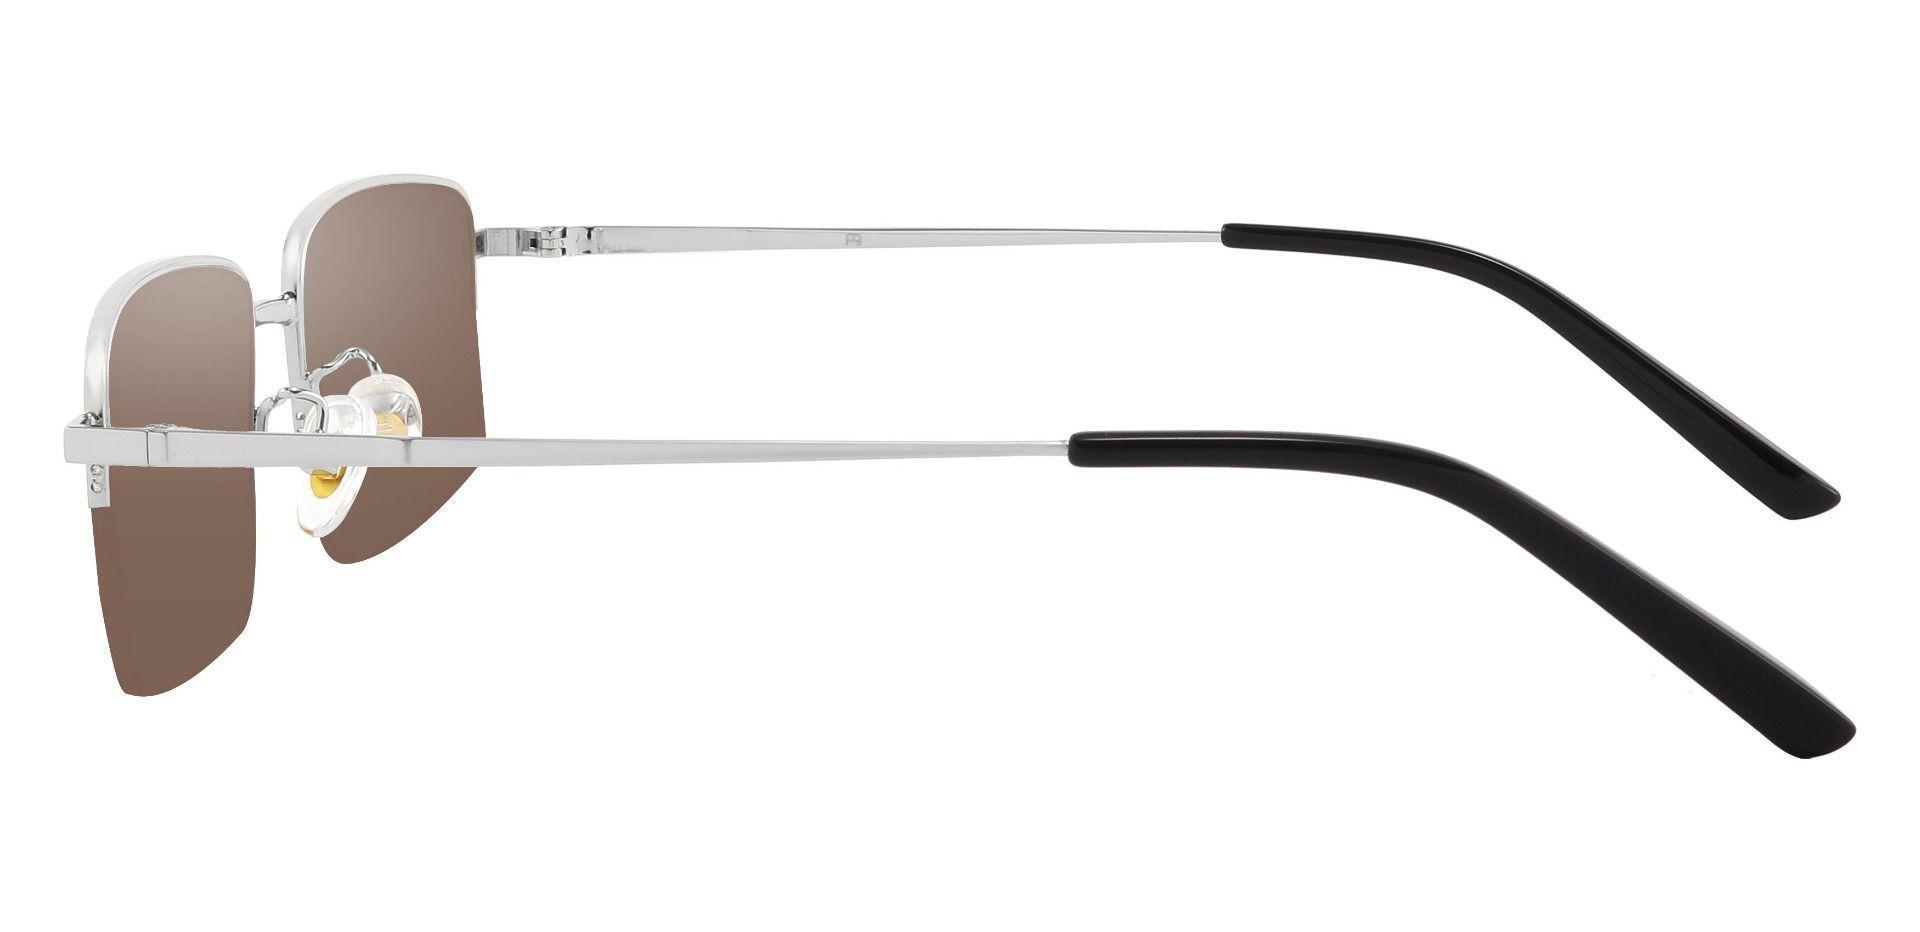 Wayne Rectangle Prescription Sunglasses - Silver Frame With Brown Lenses